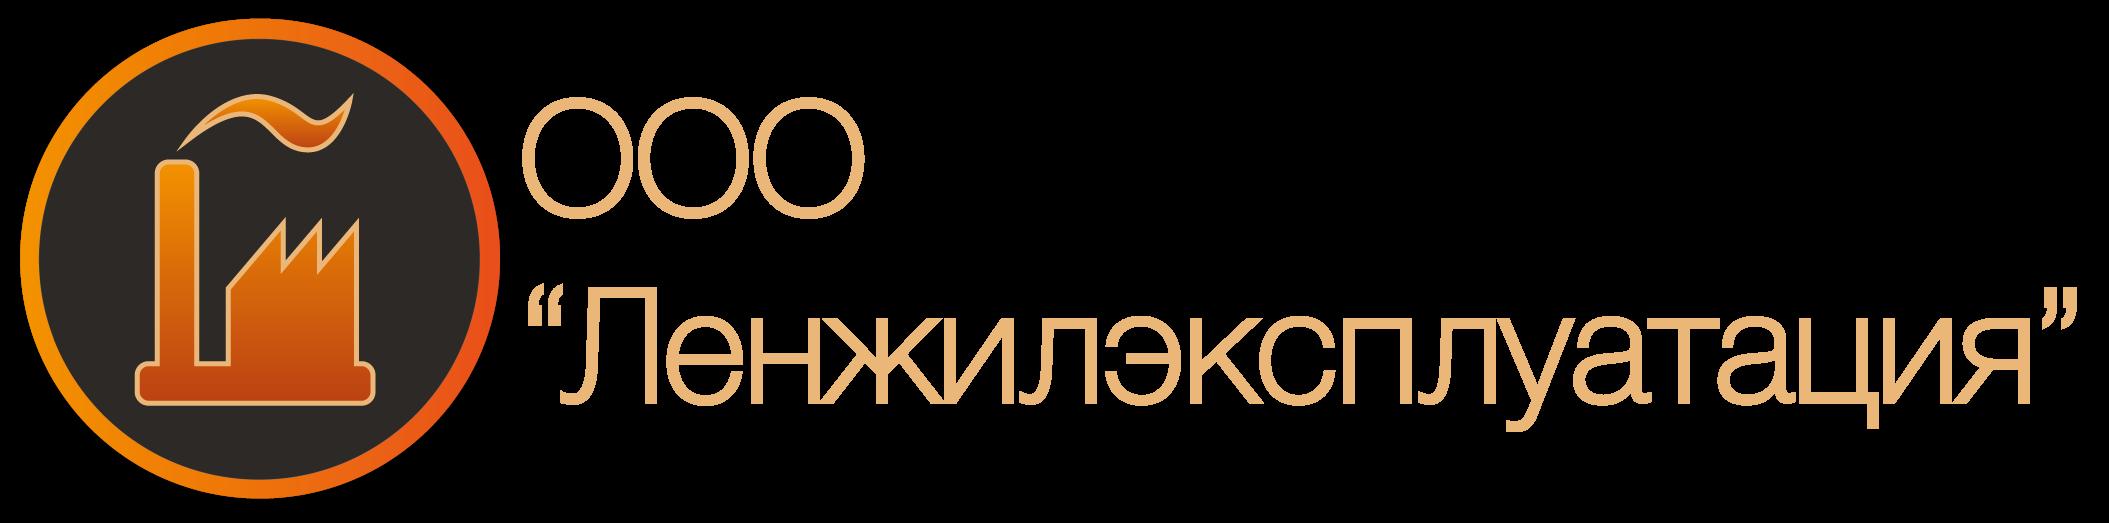 "ООО ""Ленжилэксплуатация"""